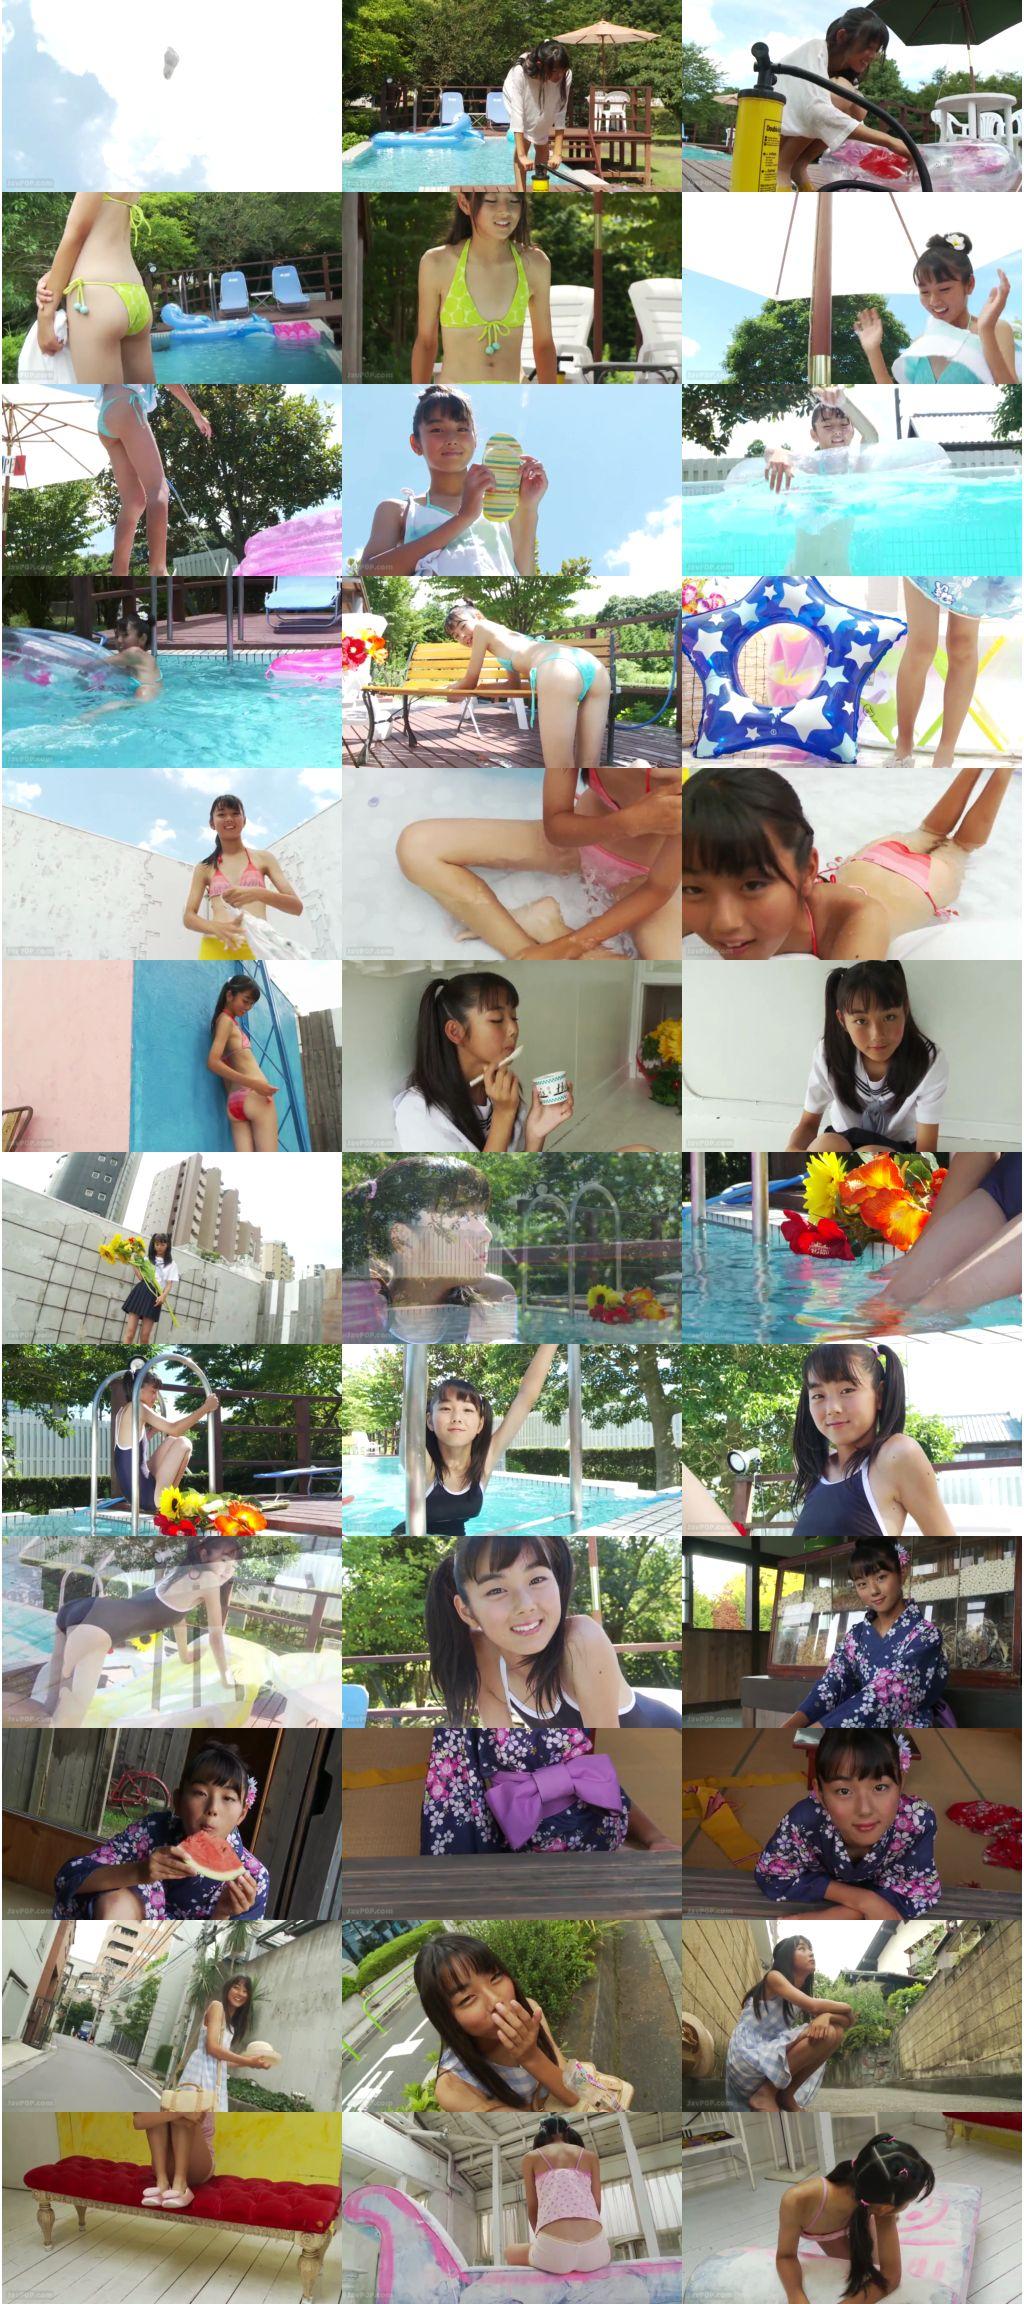 imbd 110 0 s - [IMBD-110] 河合真由 Mayu Kawai – 夏少女 Part2 残暑お見舞い申し上げ